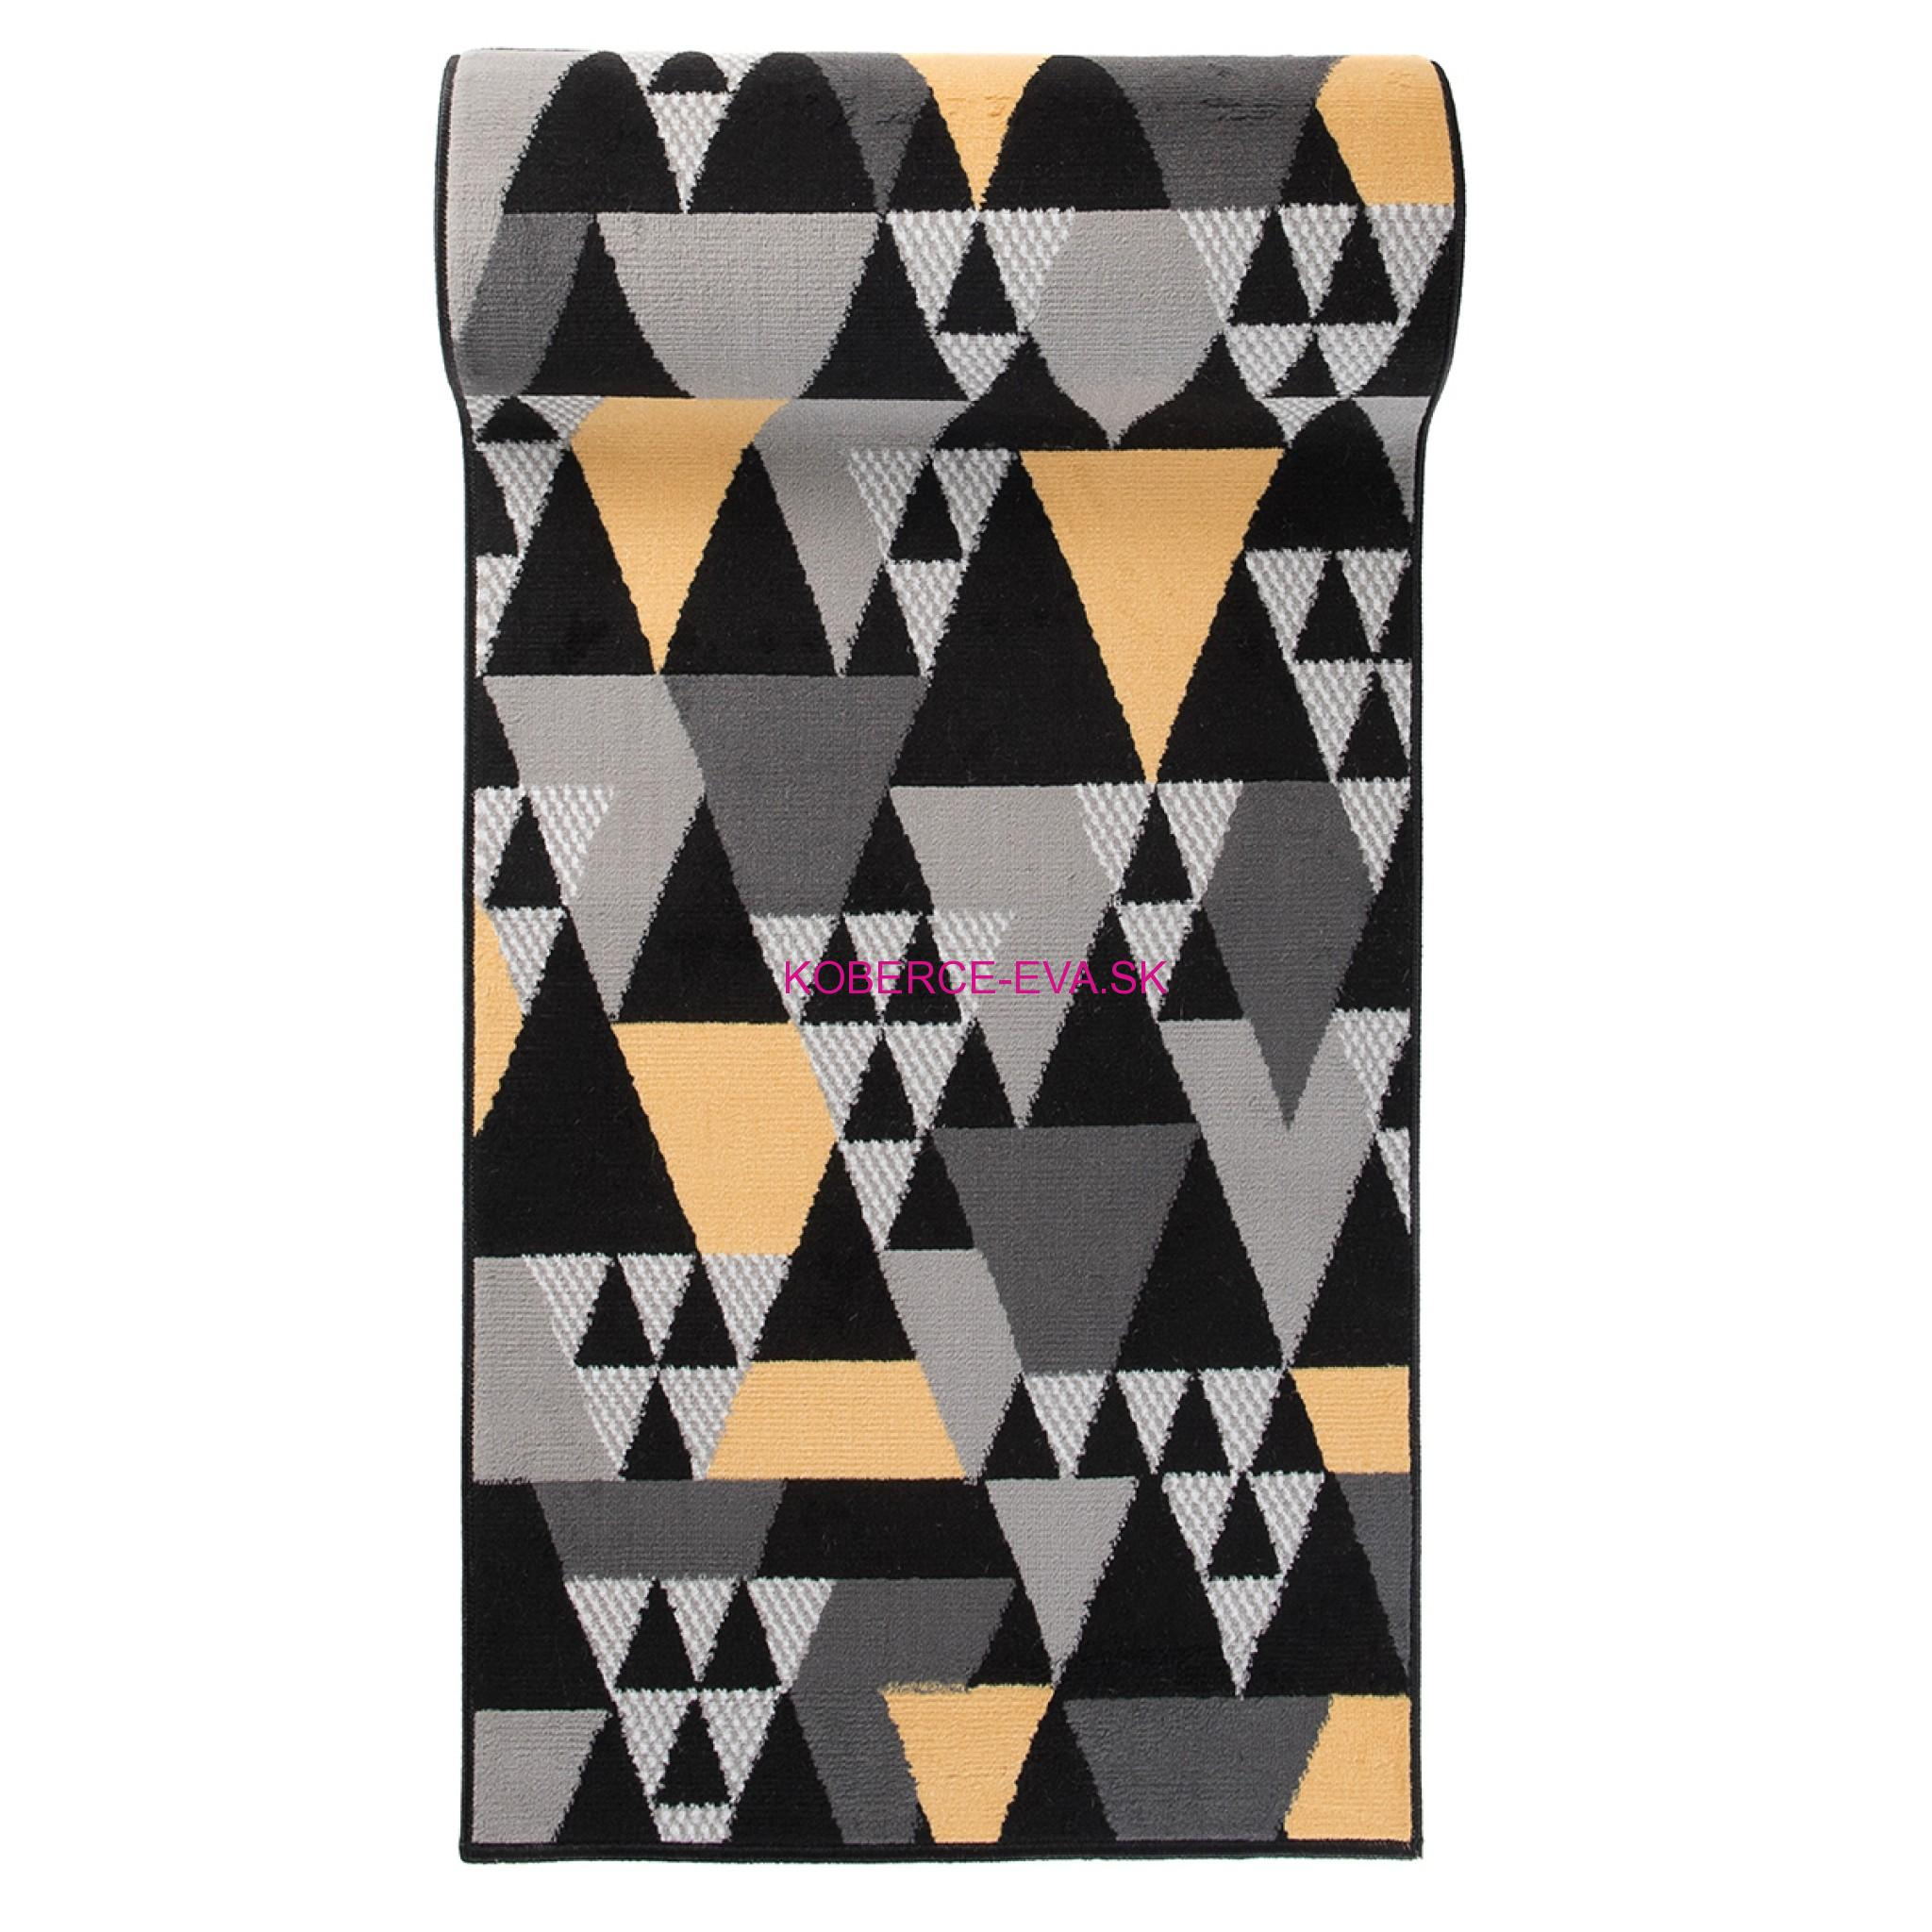 10e6e69f5 Behúň koberec BCF Z900C B | E-SHOP koberce Eva